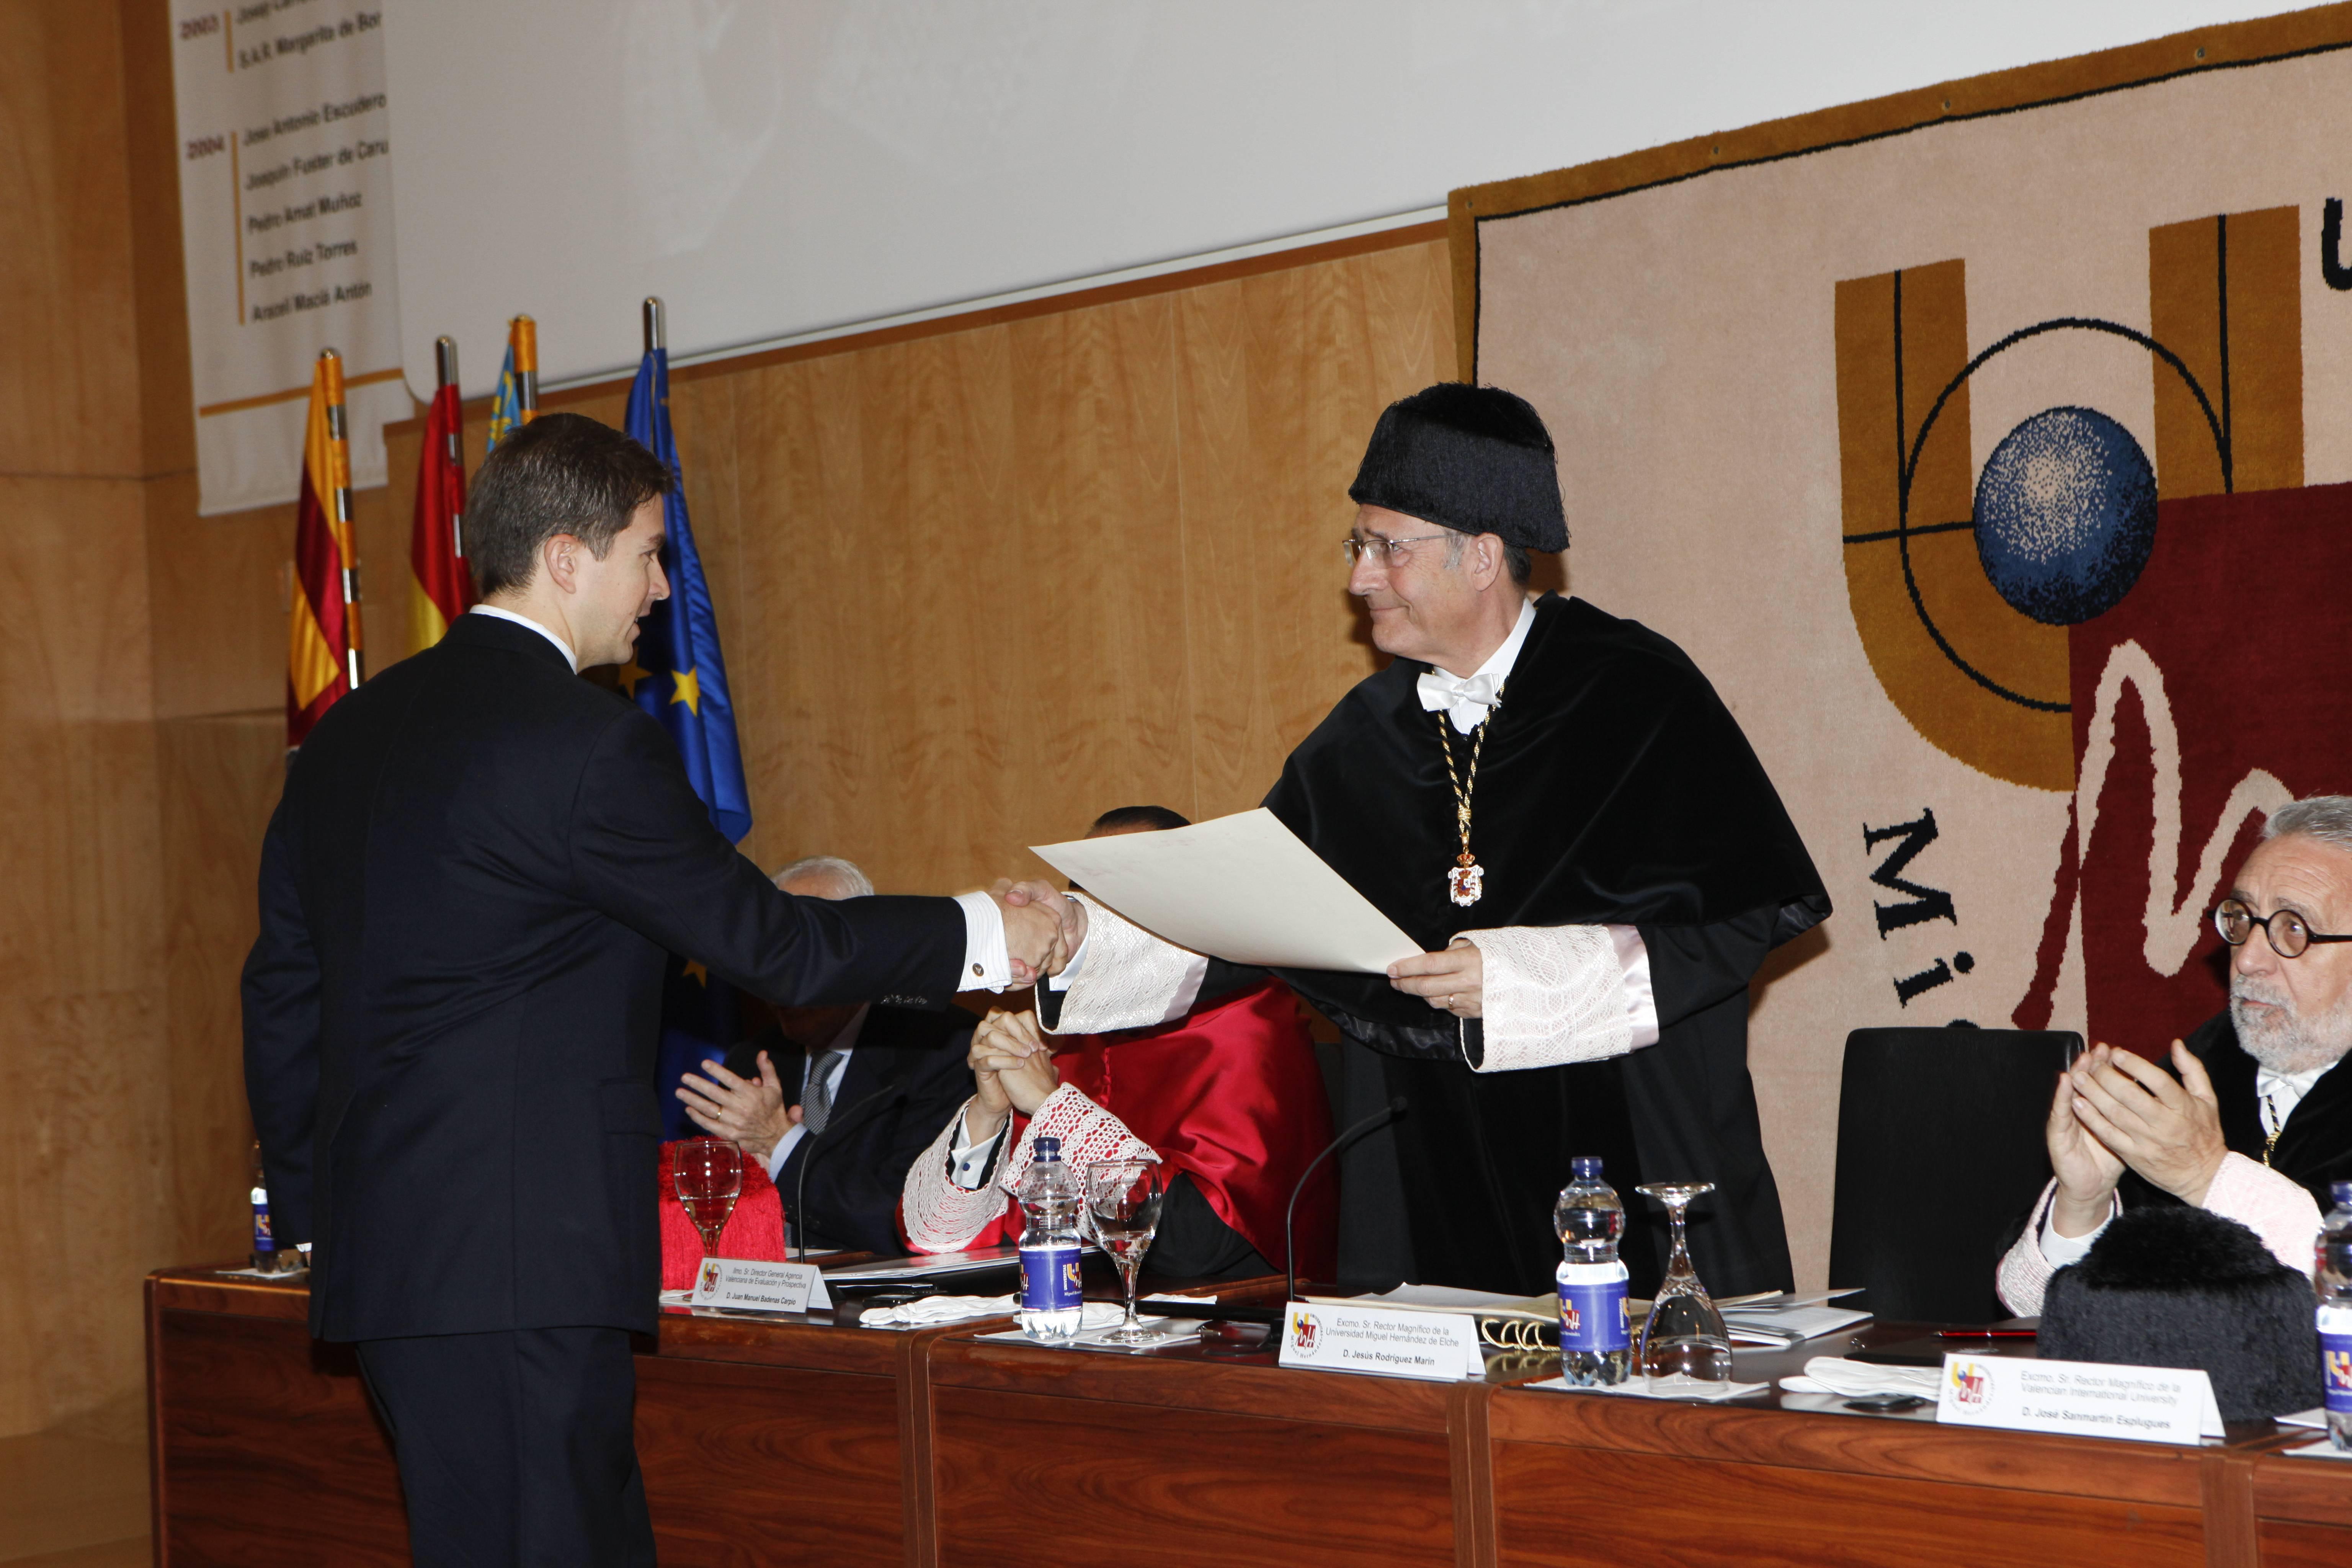 doctor-honoris-causa-luis-gamir_mg_1032.jpg